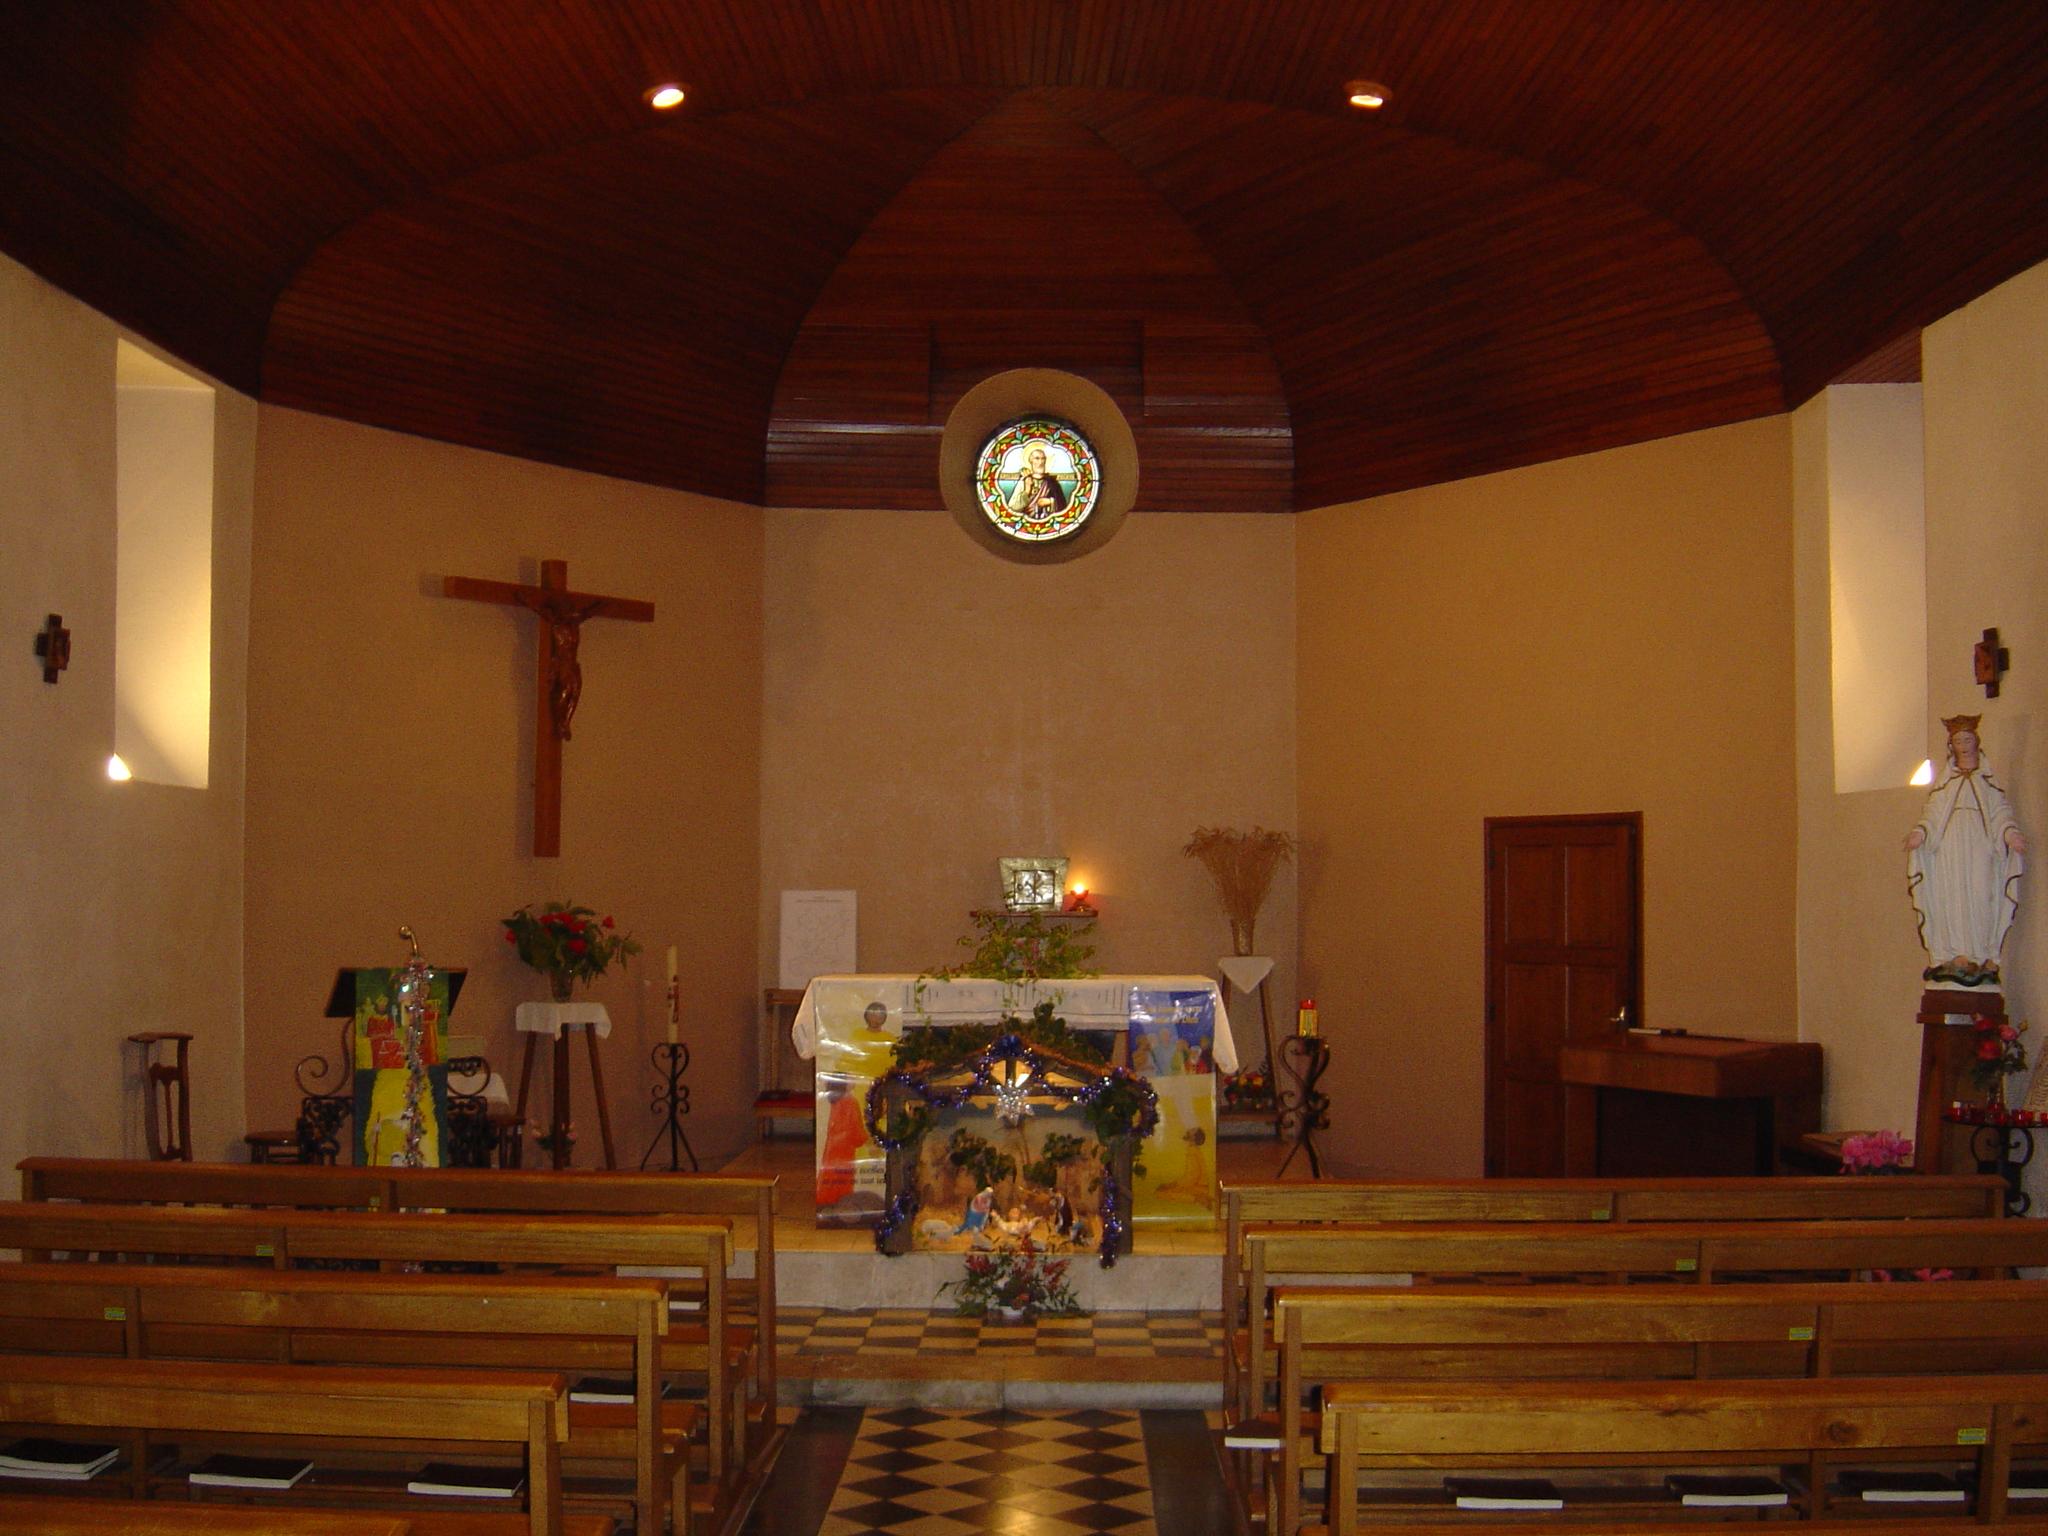 église sarpourenx 001.jpg